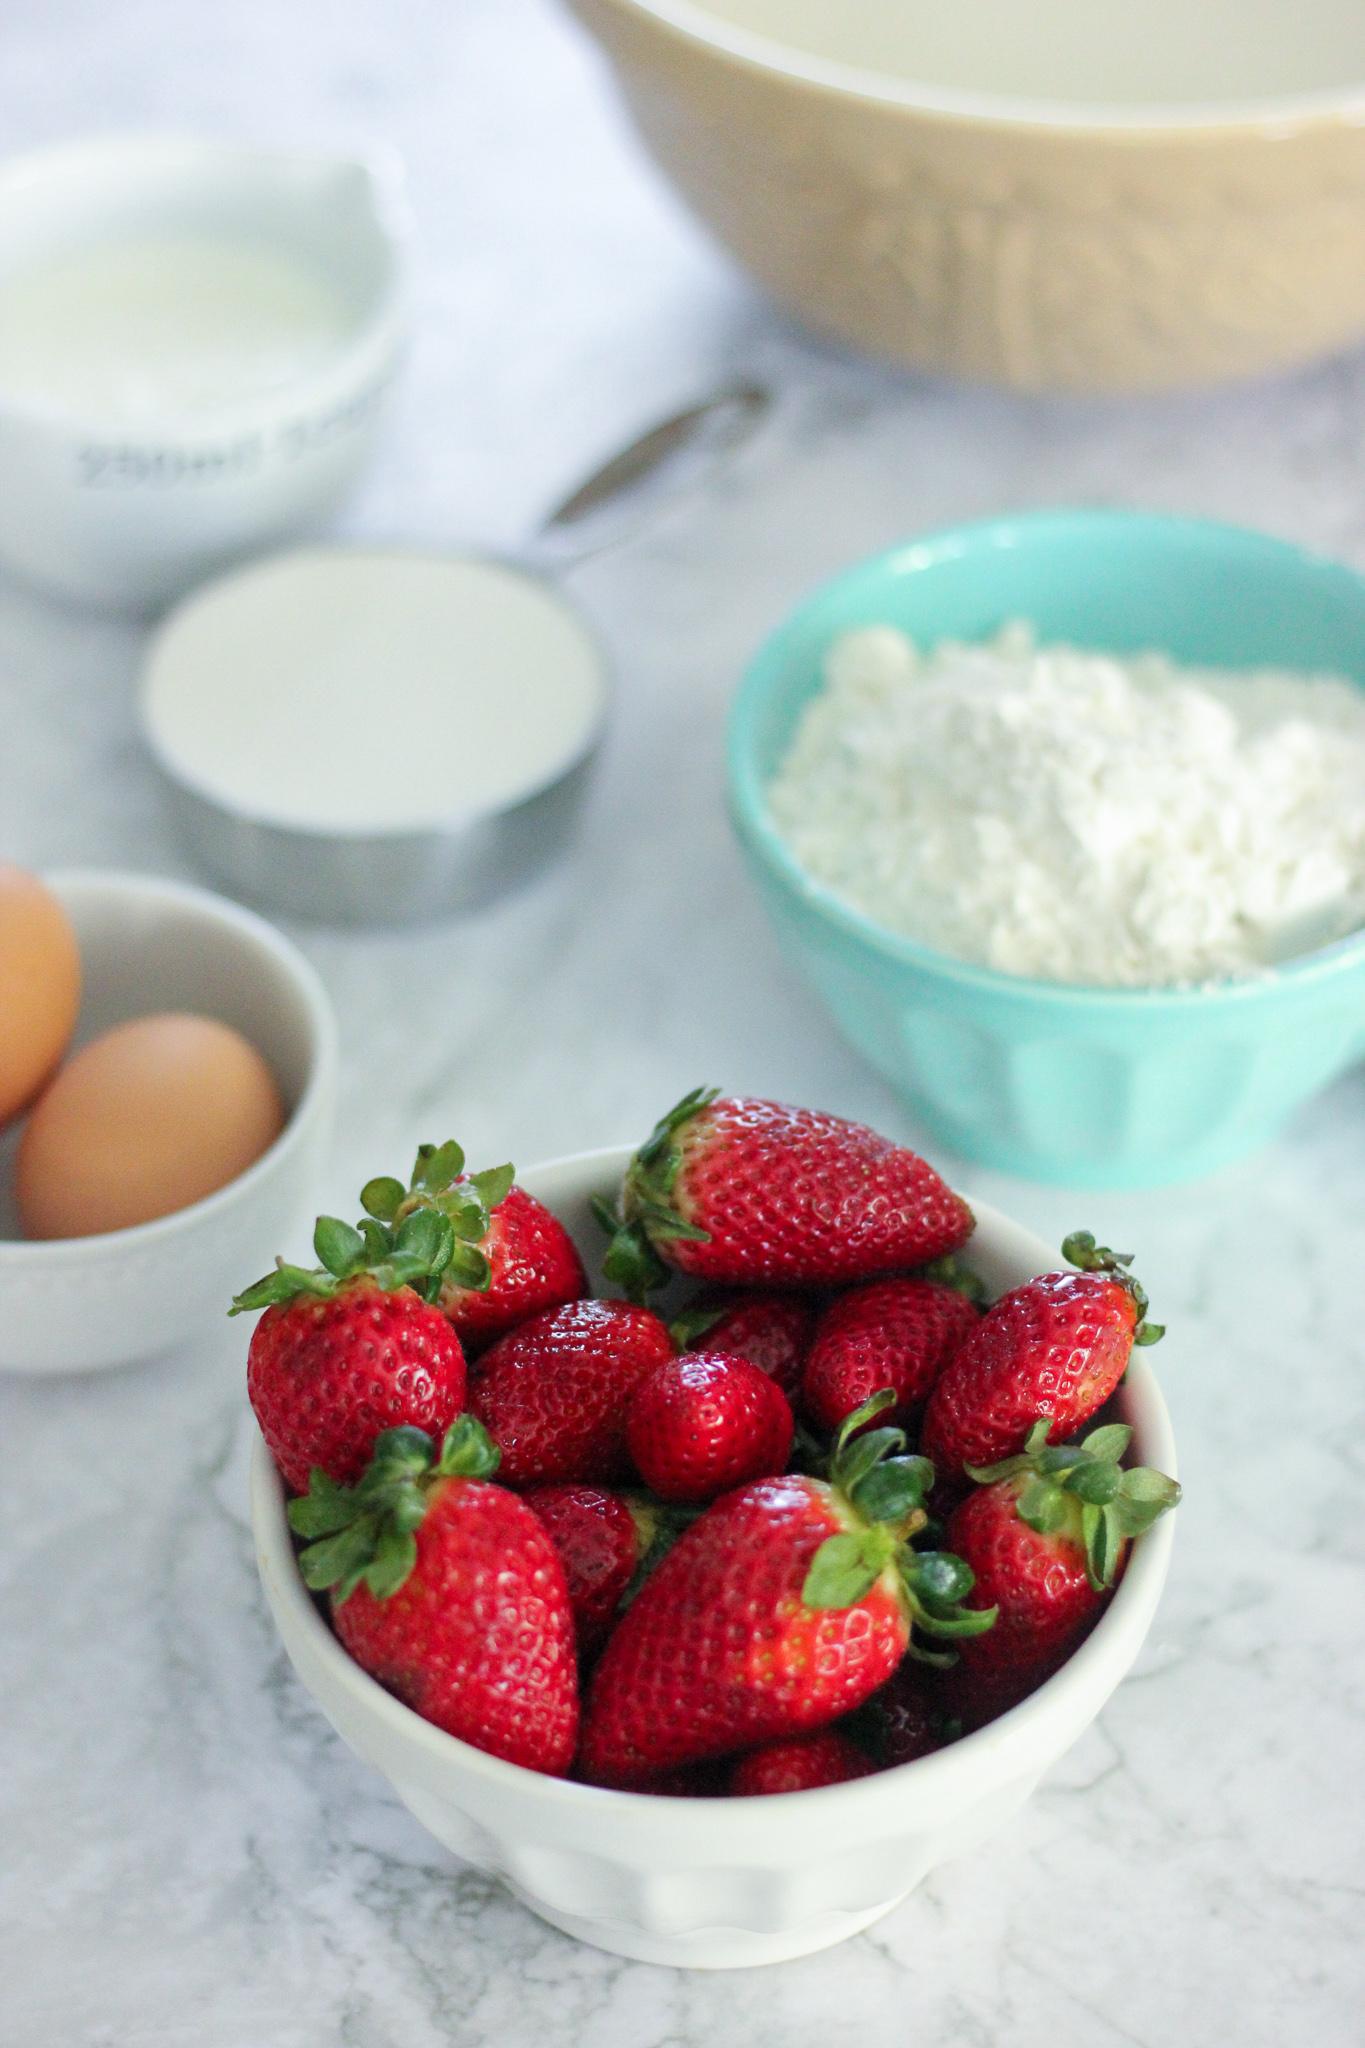 California Grown Strawberries